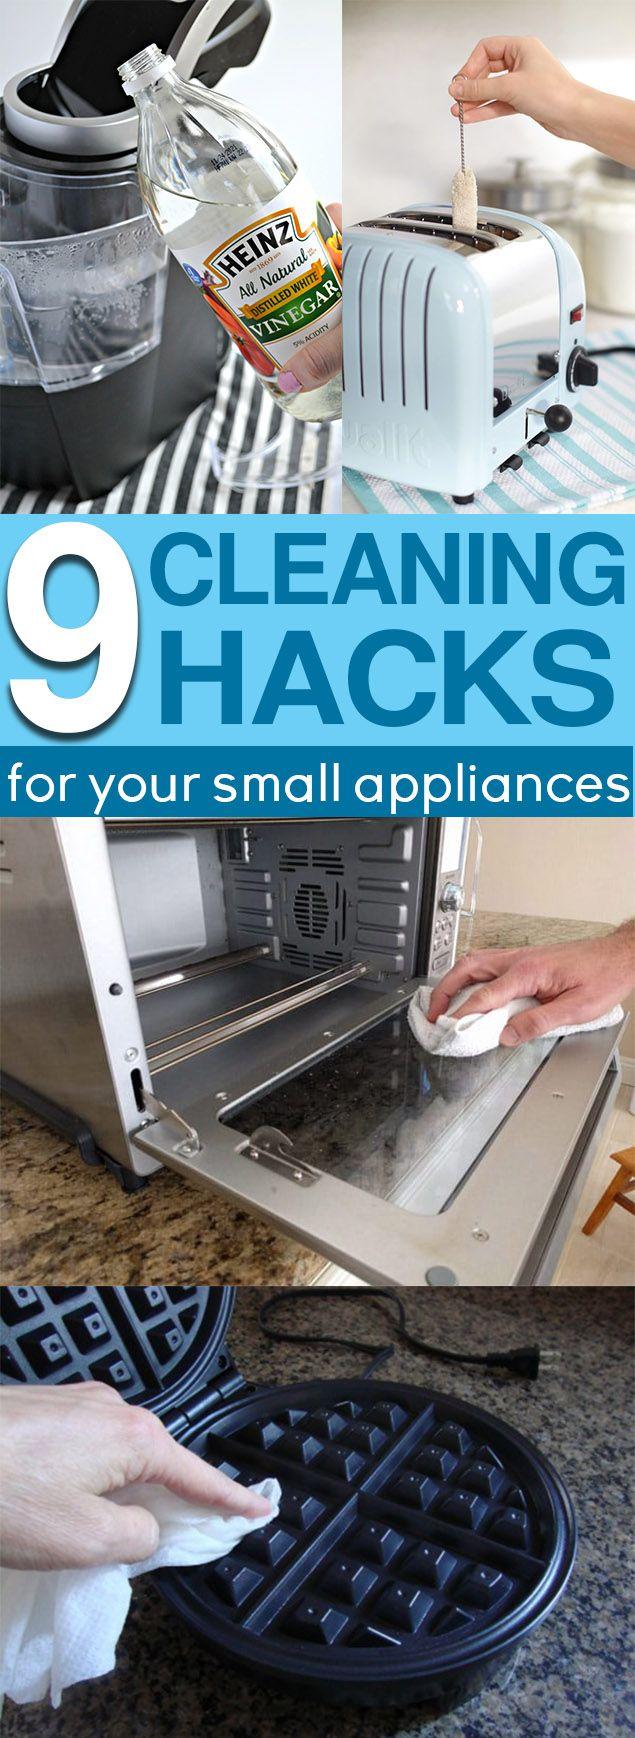 9 Cheap & Easy Ways to Clean Small Kitchen Appliances | Keurig ...